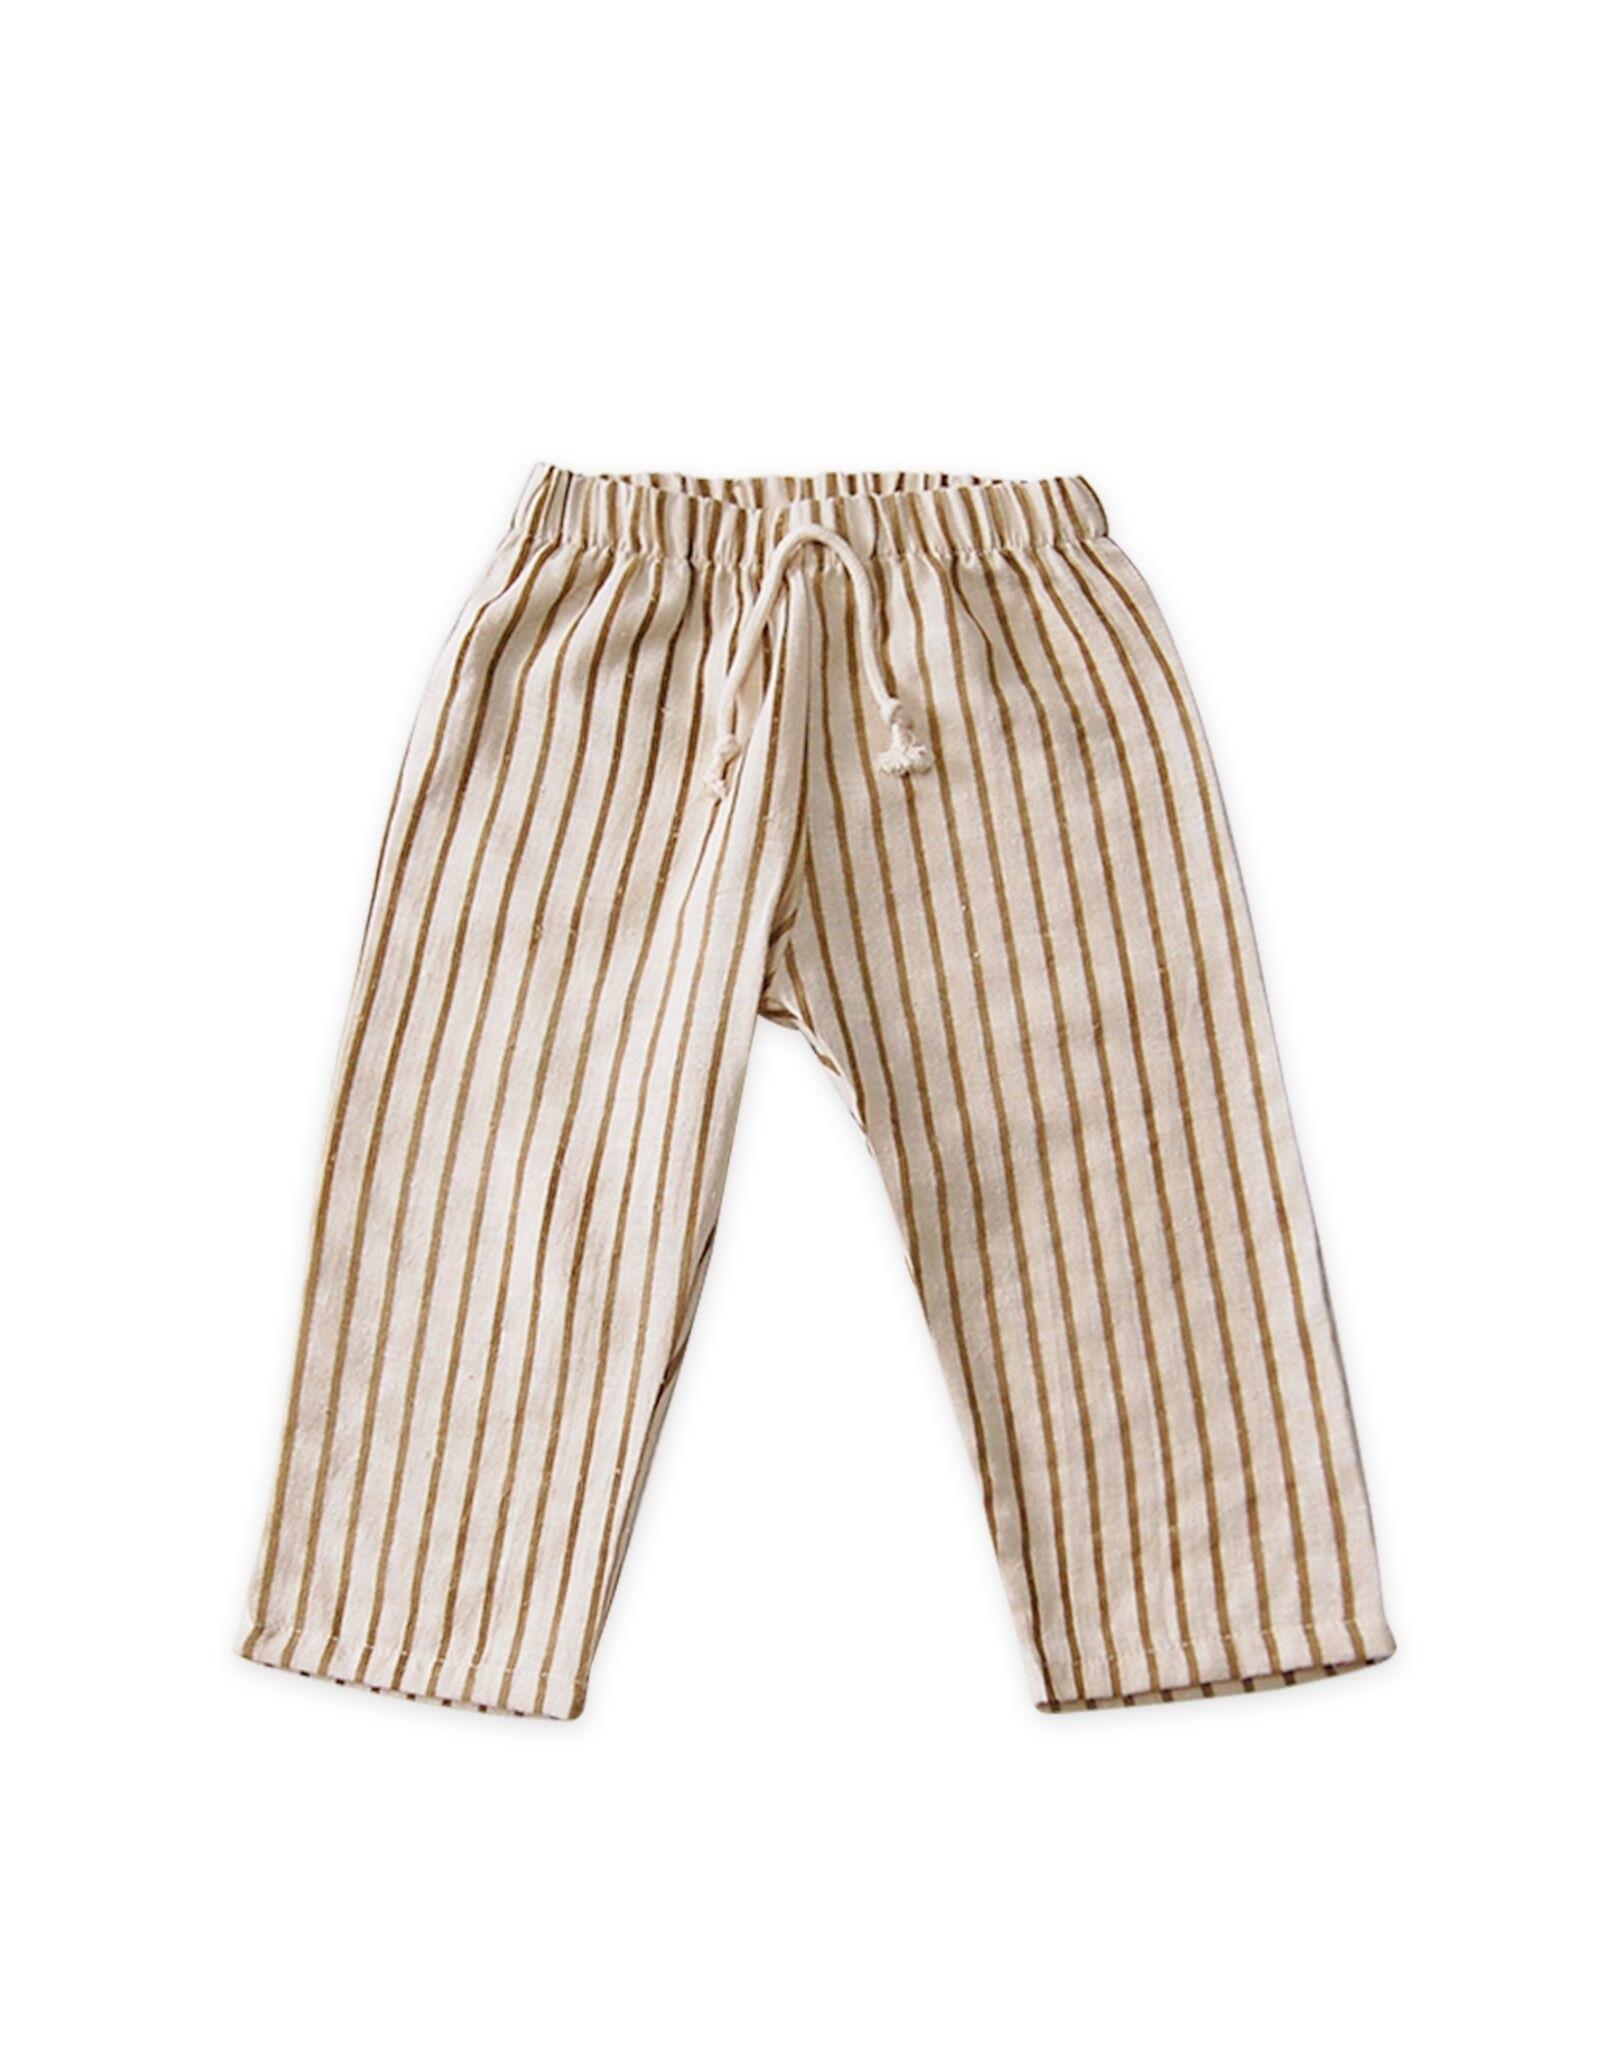 Go Gently Nation lawn pant- fennel stripe